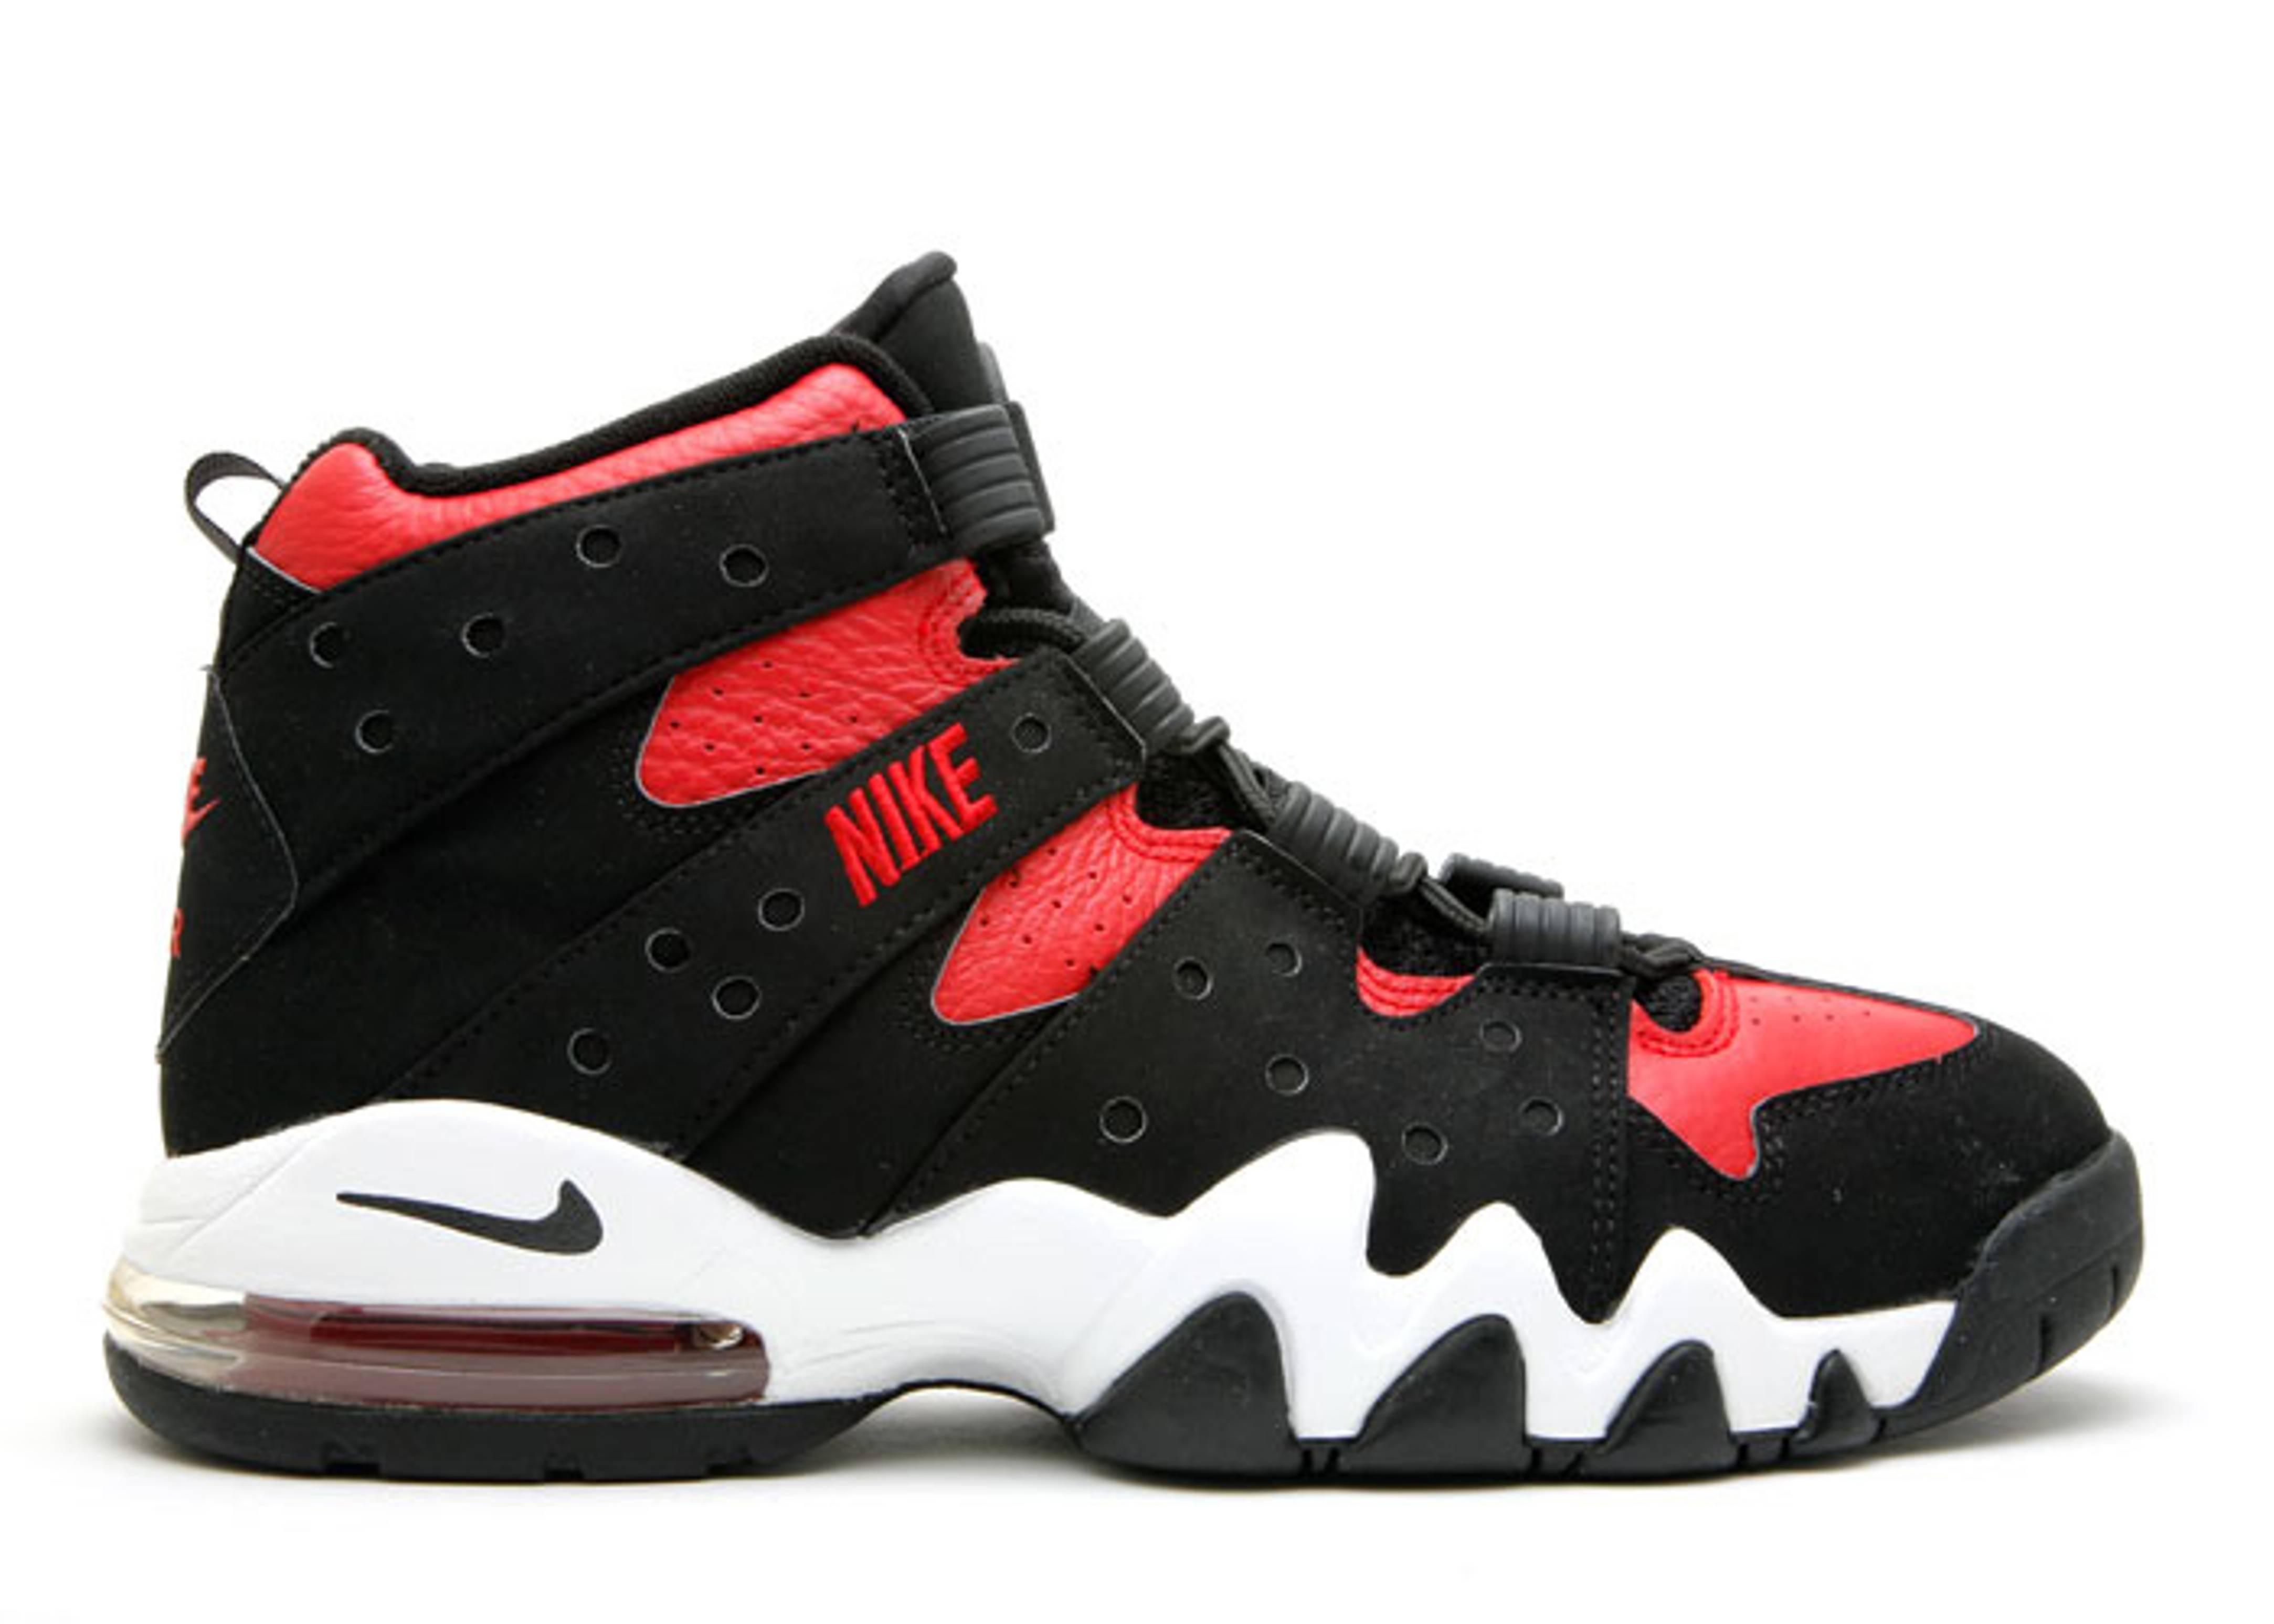 769af65291 Air Max2 Cb 94 - Nike - 305440 061 - black/varsity red-white ...